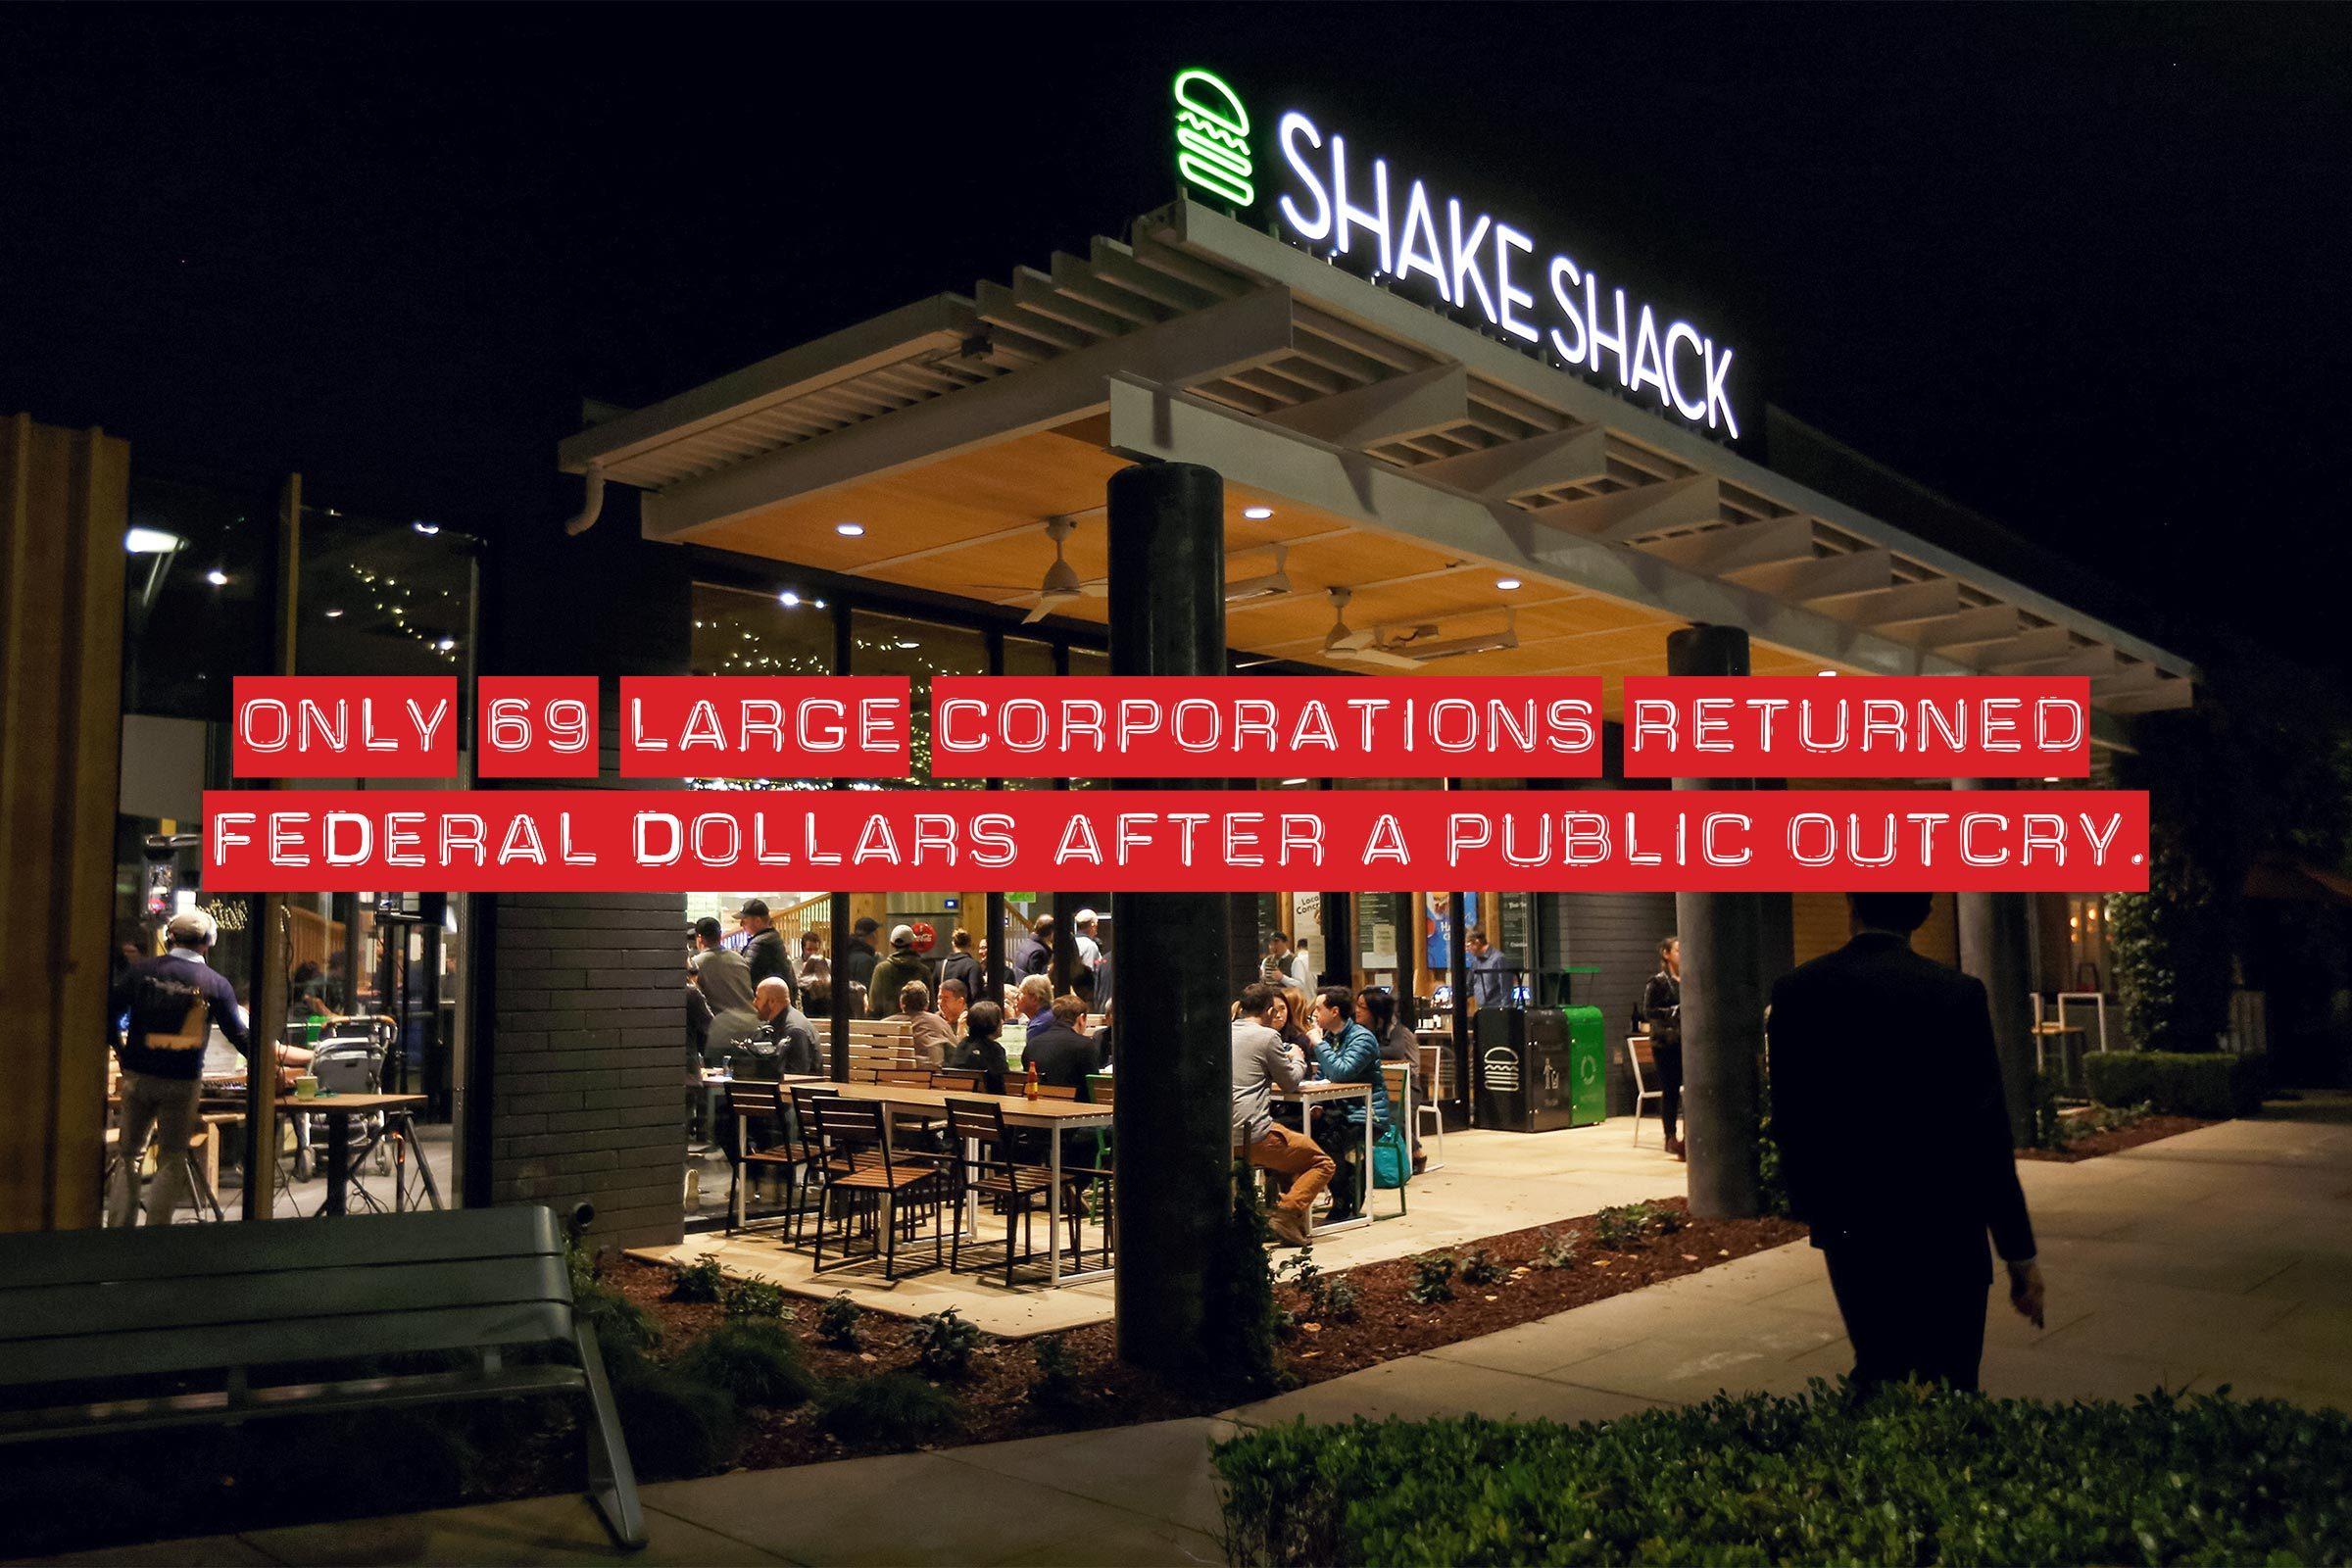 shake shack restuarant at night